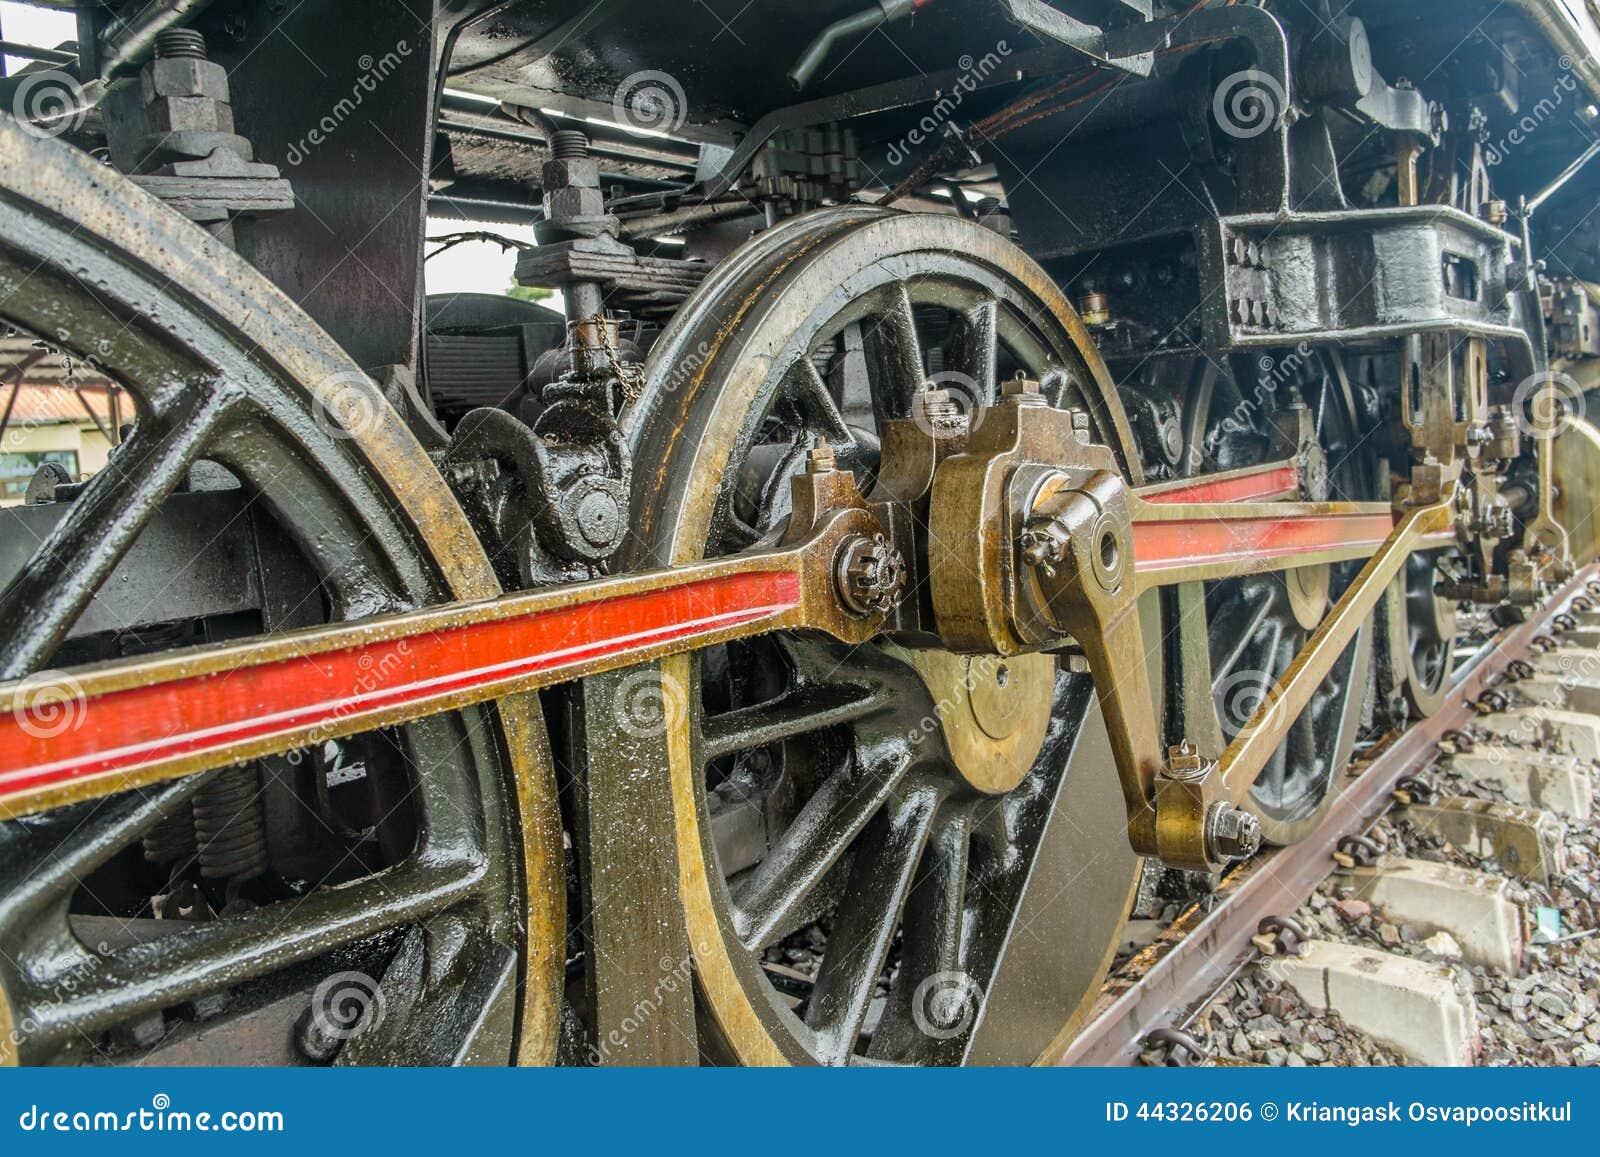 Close Up Of Steam Locomotive Piston And Rod Mechanism Stock